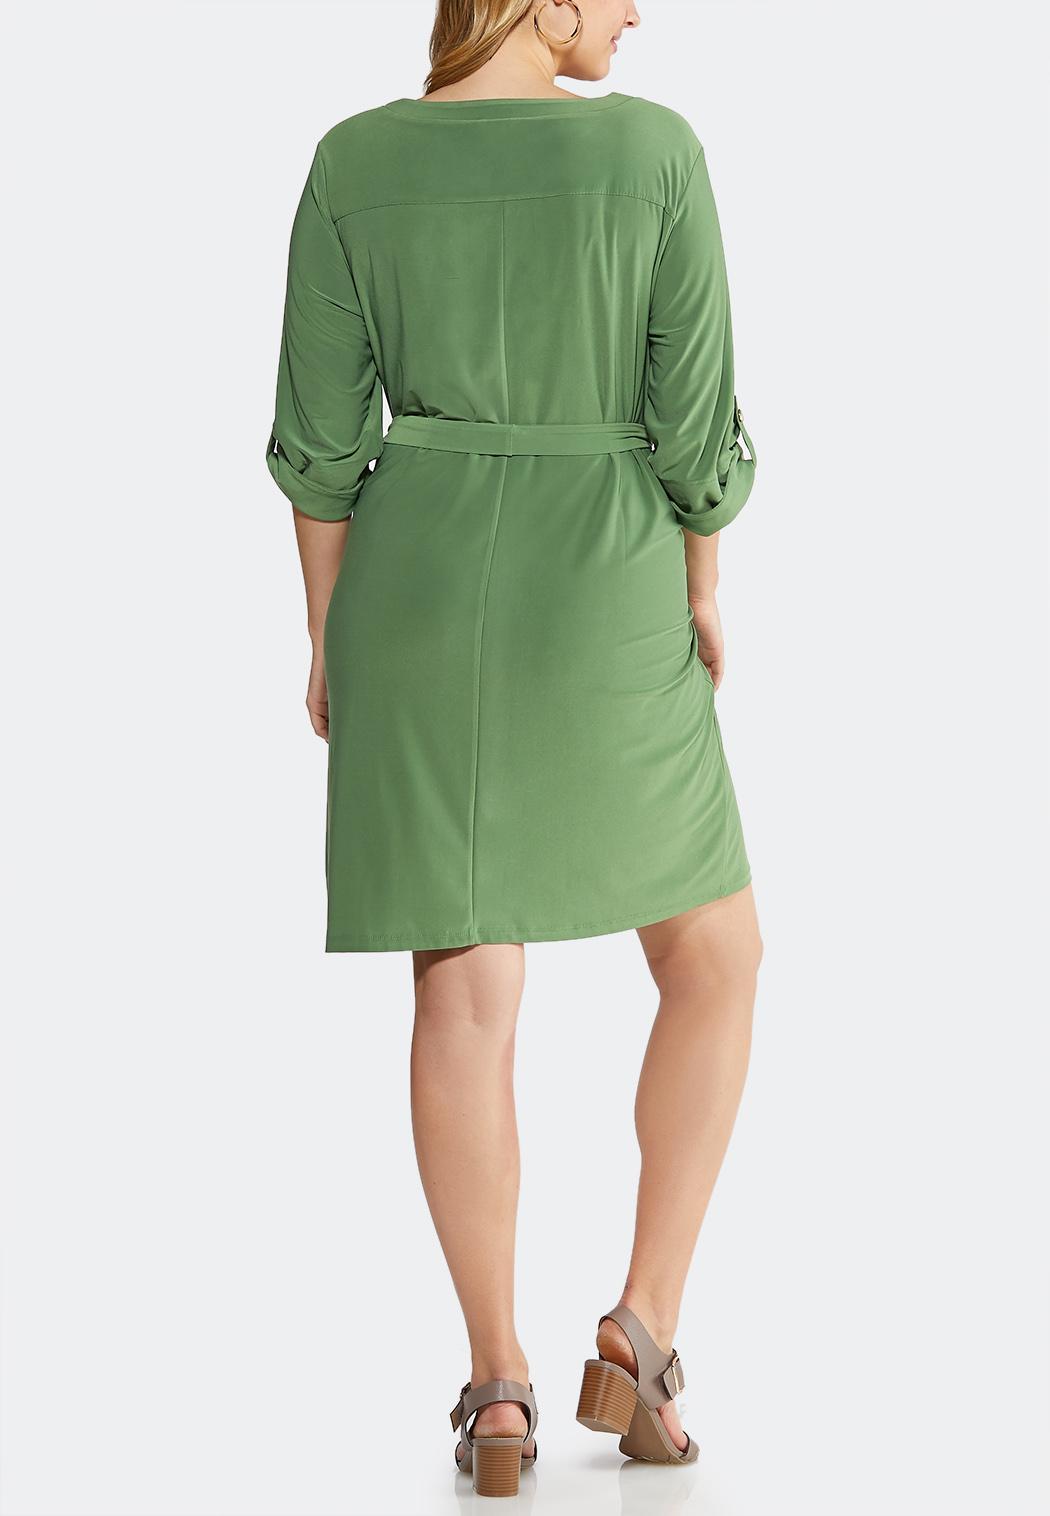 Plus Size Solid Tie Waist Shirt Dress (Item #43584913)